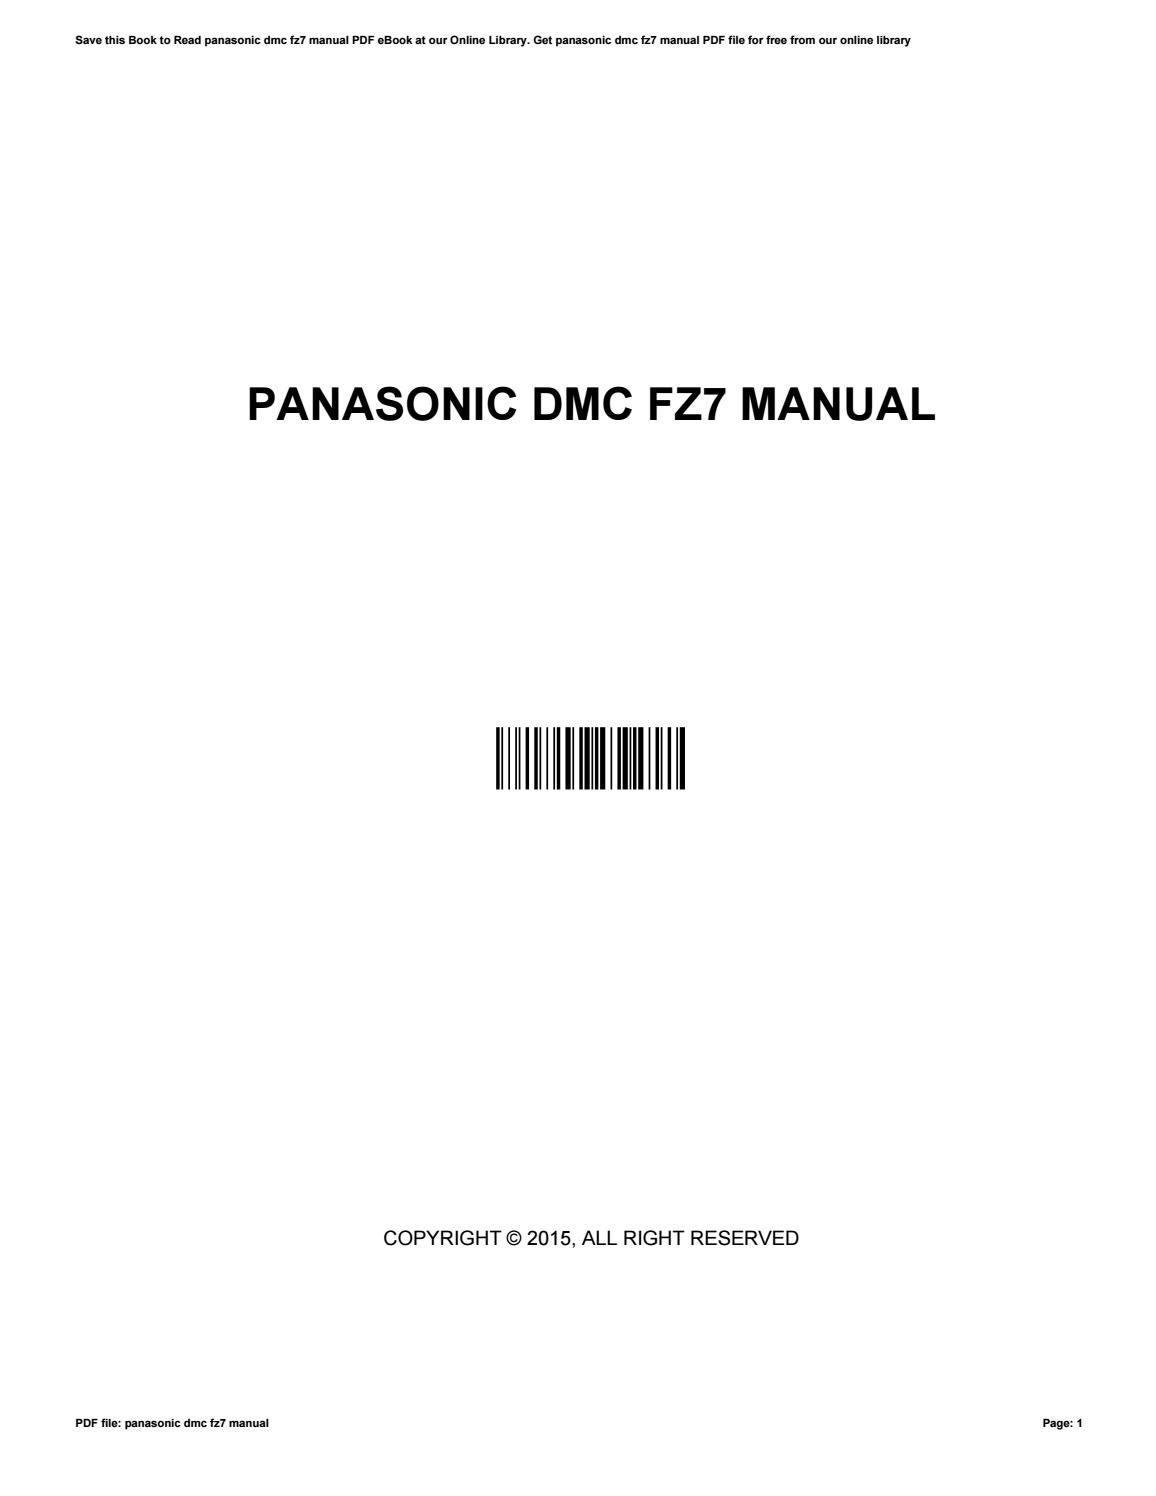 manual olympus e 510 espa c3 a3 c6 92 c3 a2 c2 b1ol user guide rh mobiservicemanual today